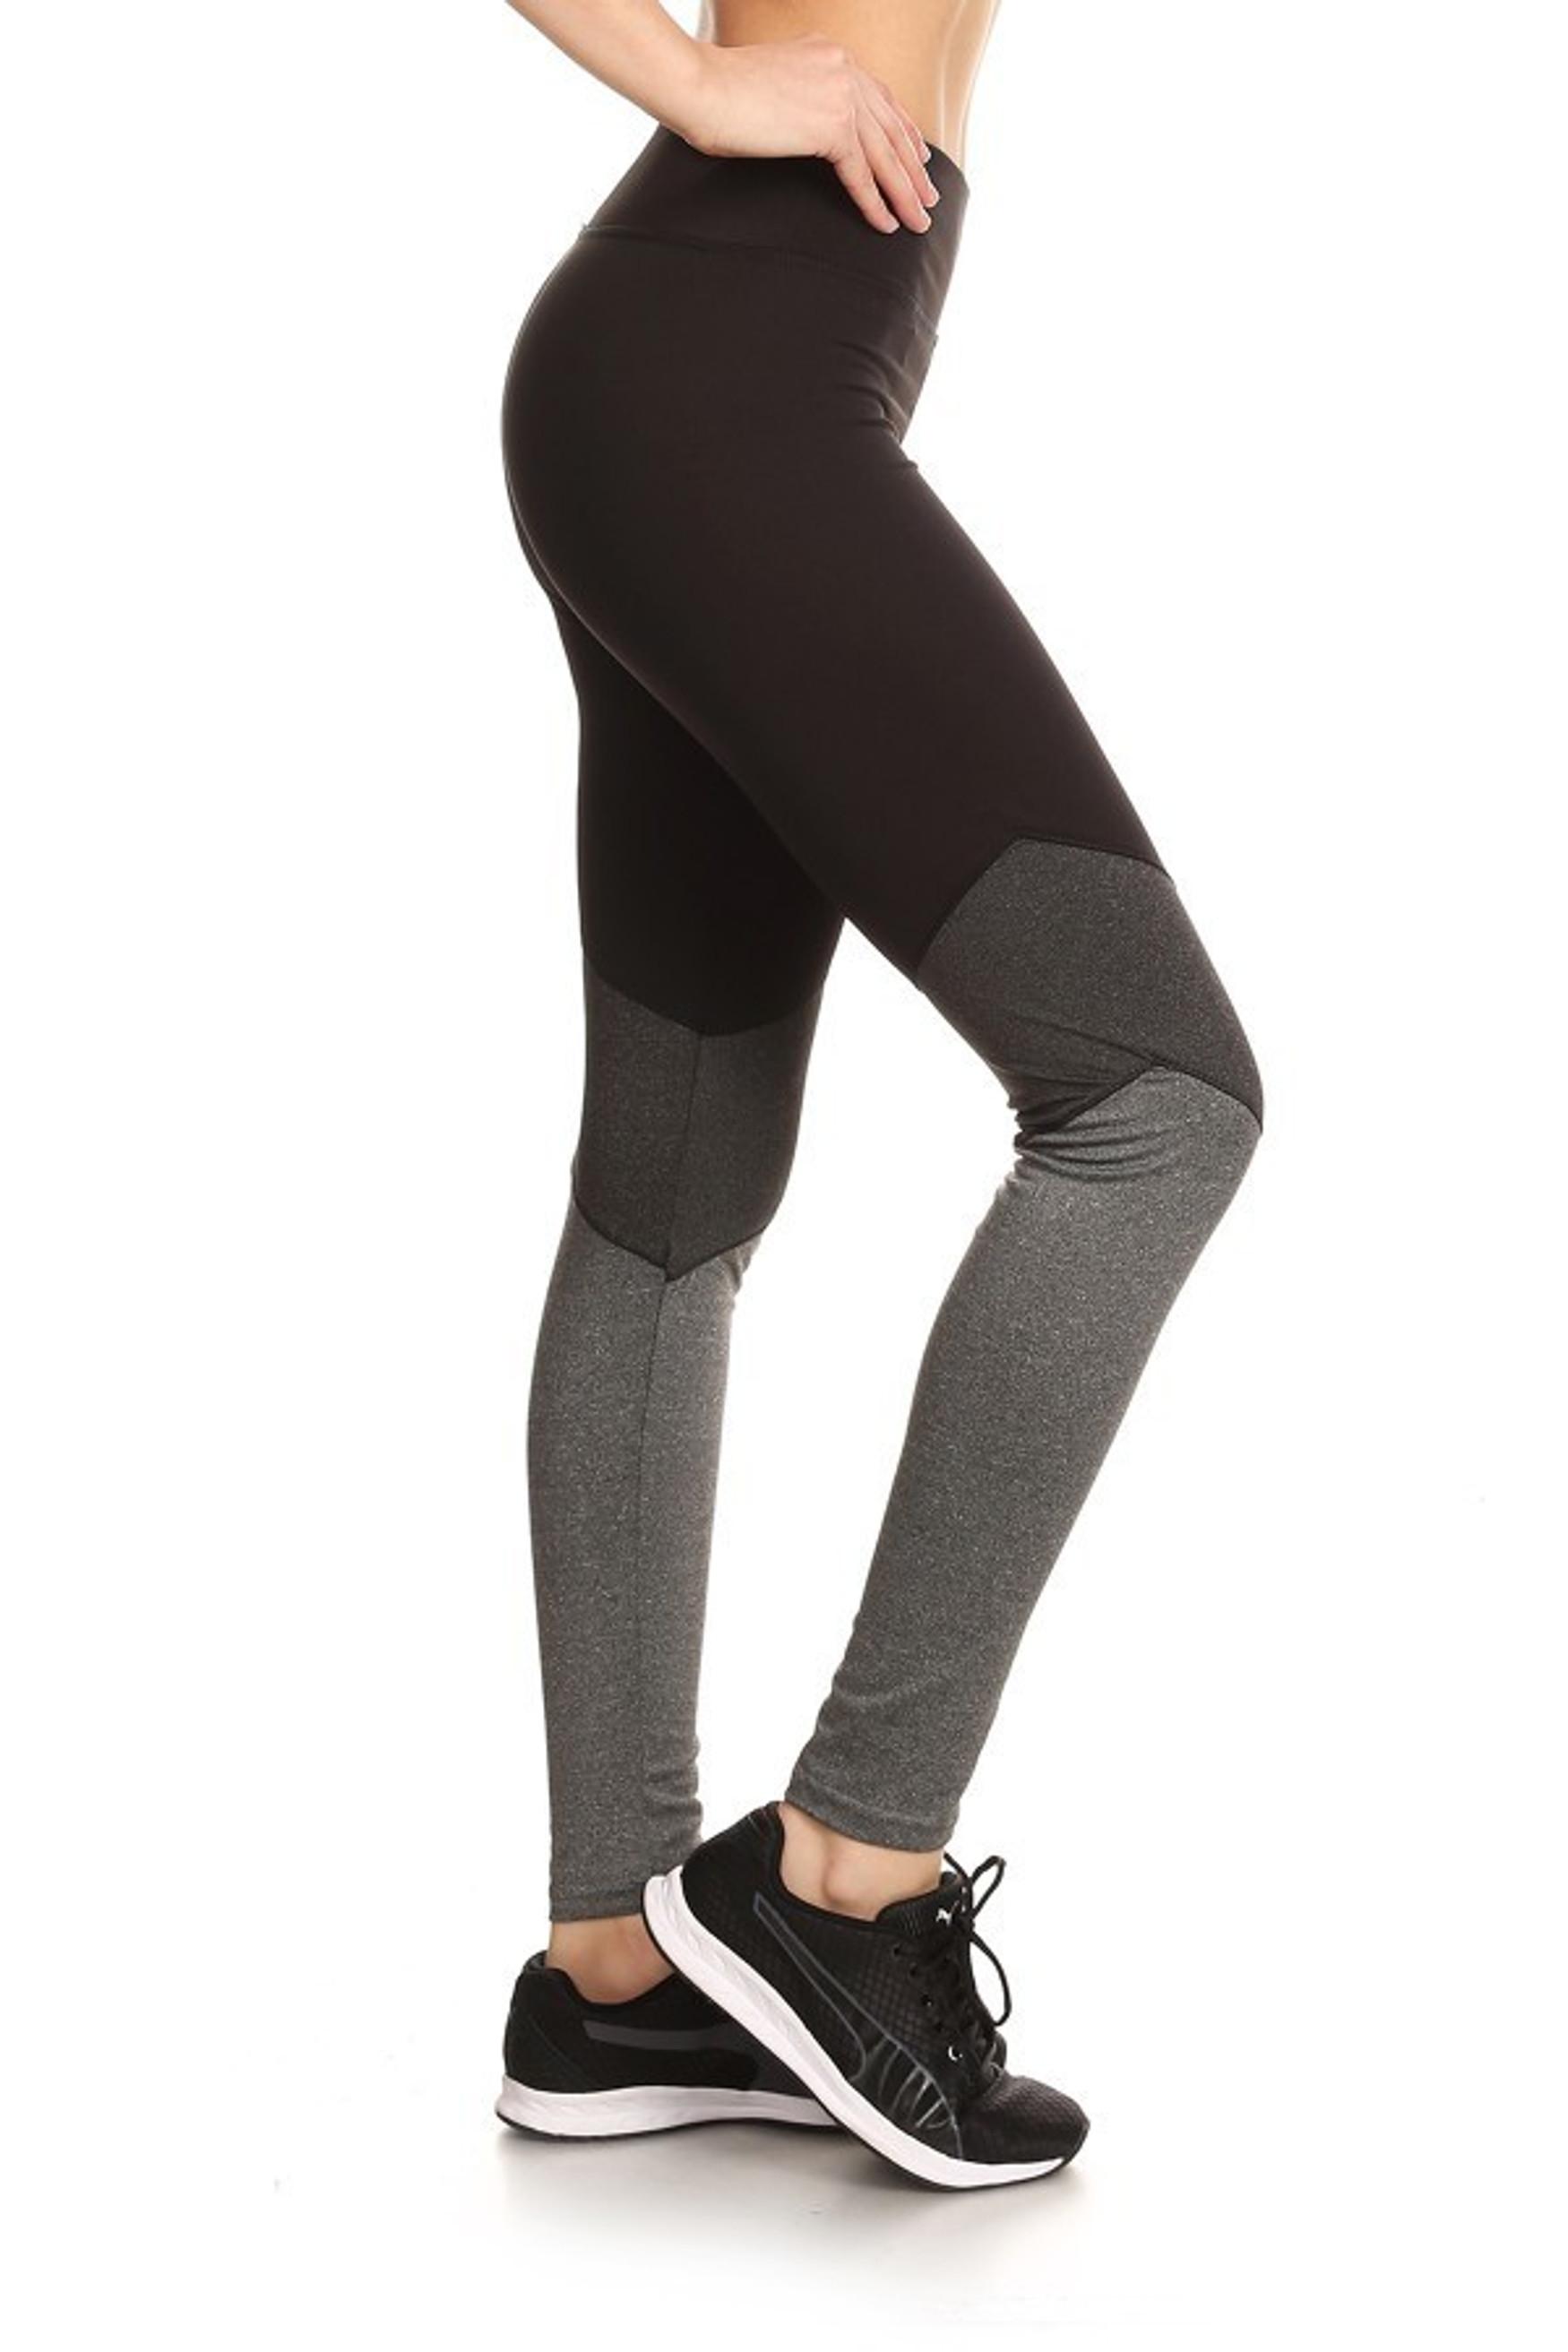 Dominion Tri-Blend Women's Sport Leggings